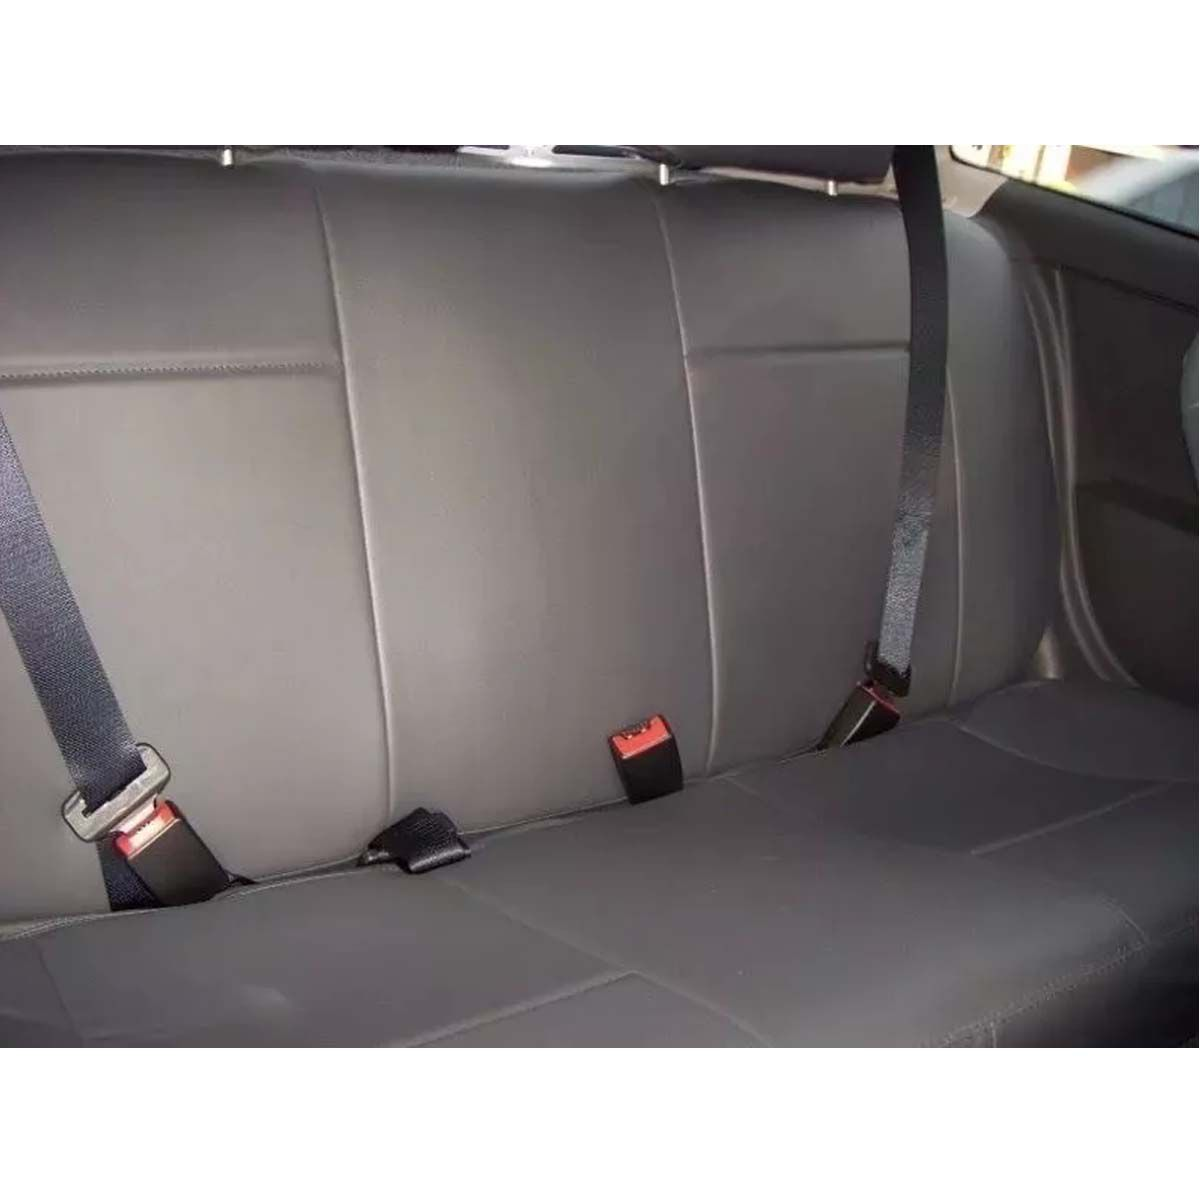 Jogo de Capas de Banco em Couro Sintético para Peugeot 106 206 306 Sw Universal Preto